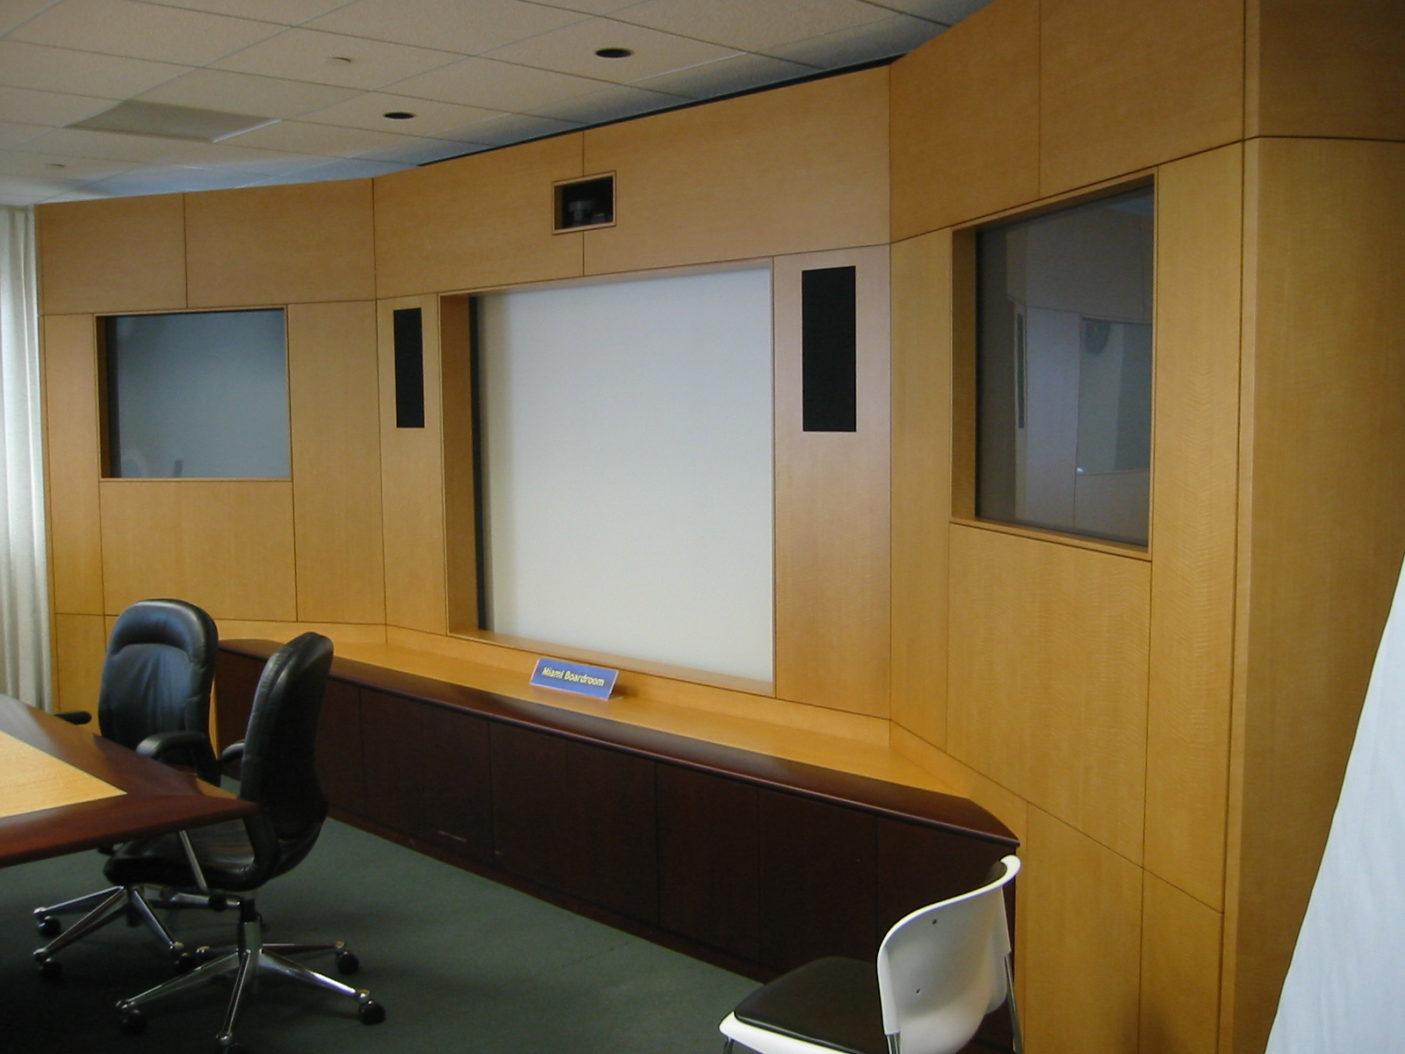 Wall-Tv-Units-77.jpg